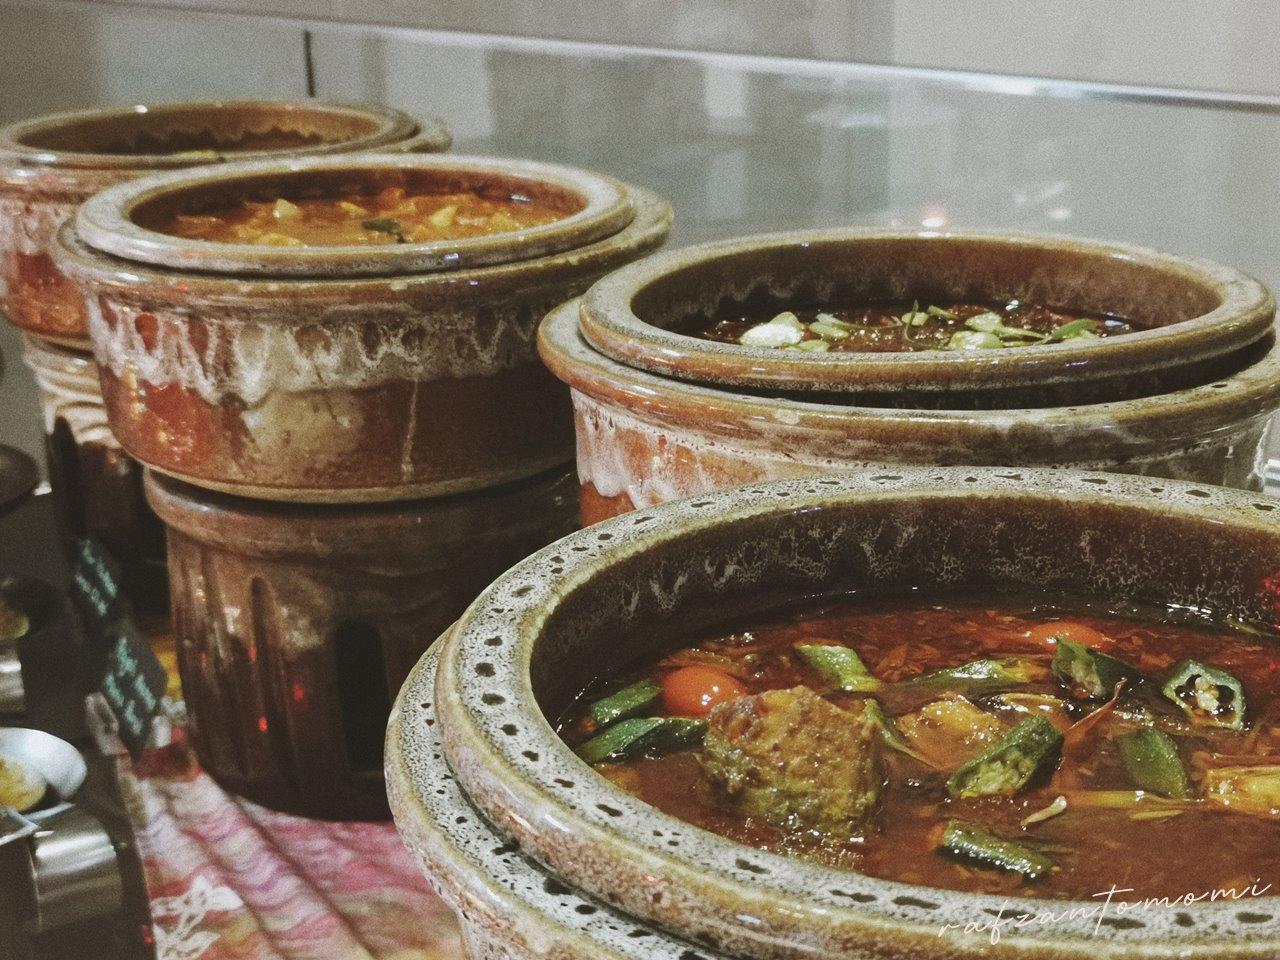 Bufet Ramadan 2021 - Nook, Aloft Kuala Lumpur Sentral